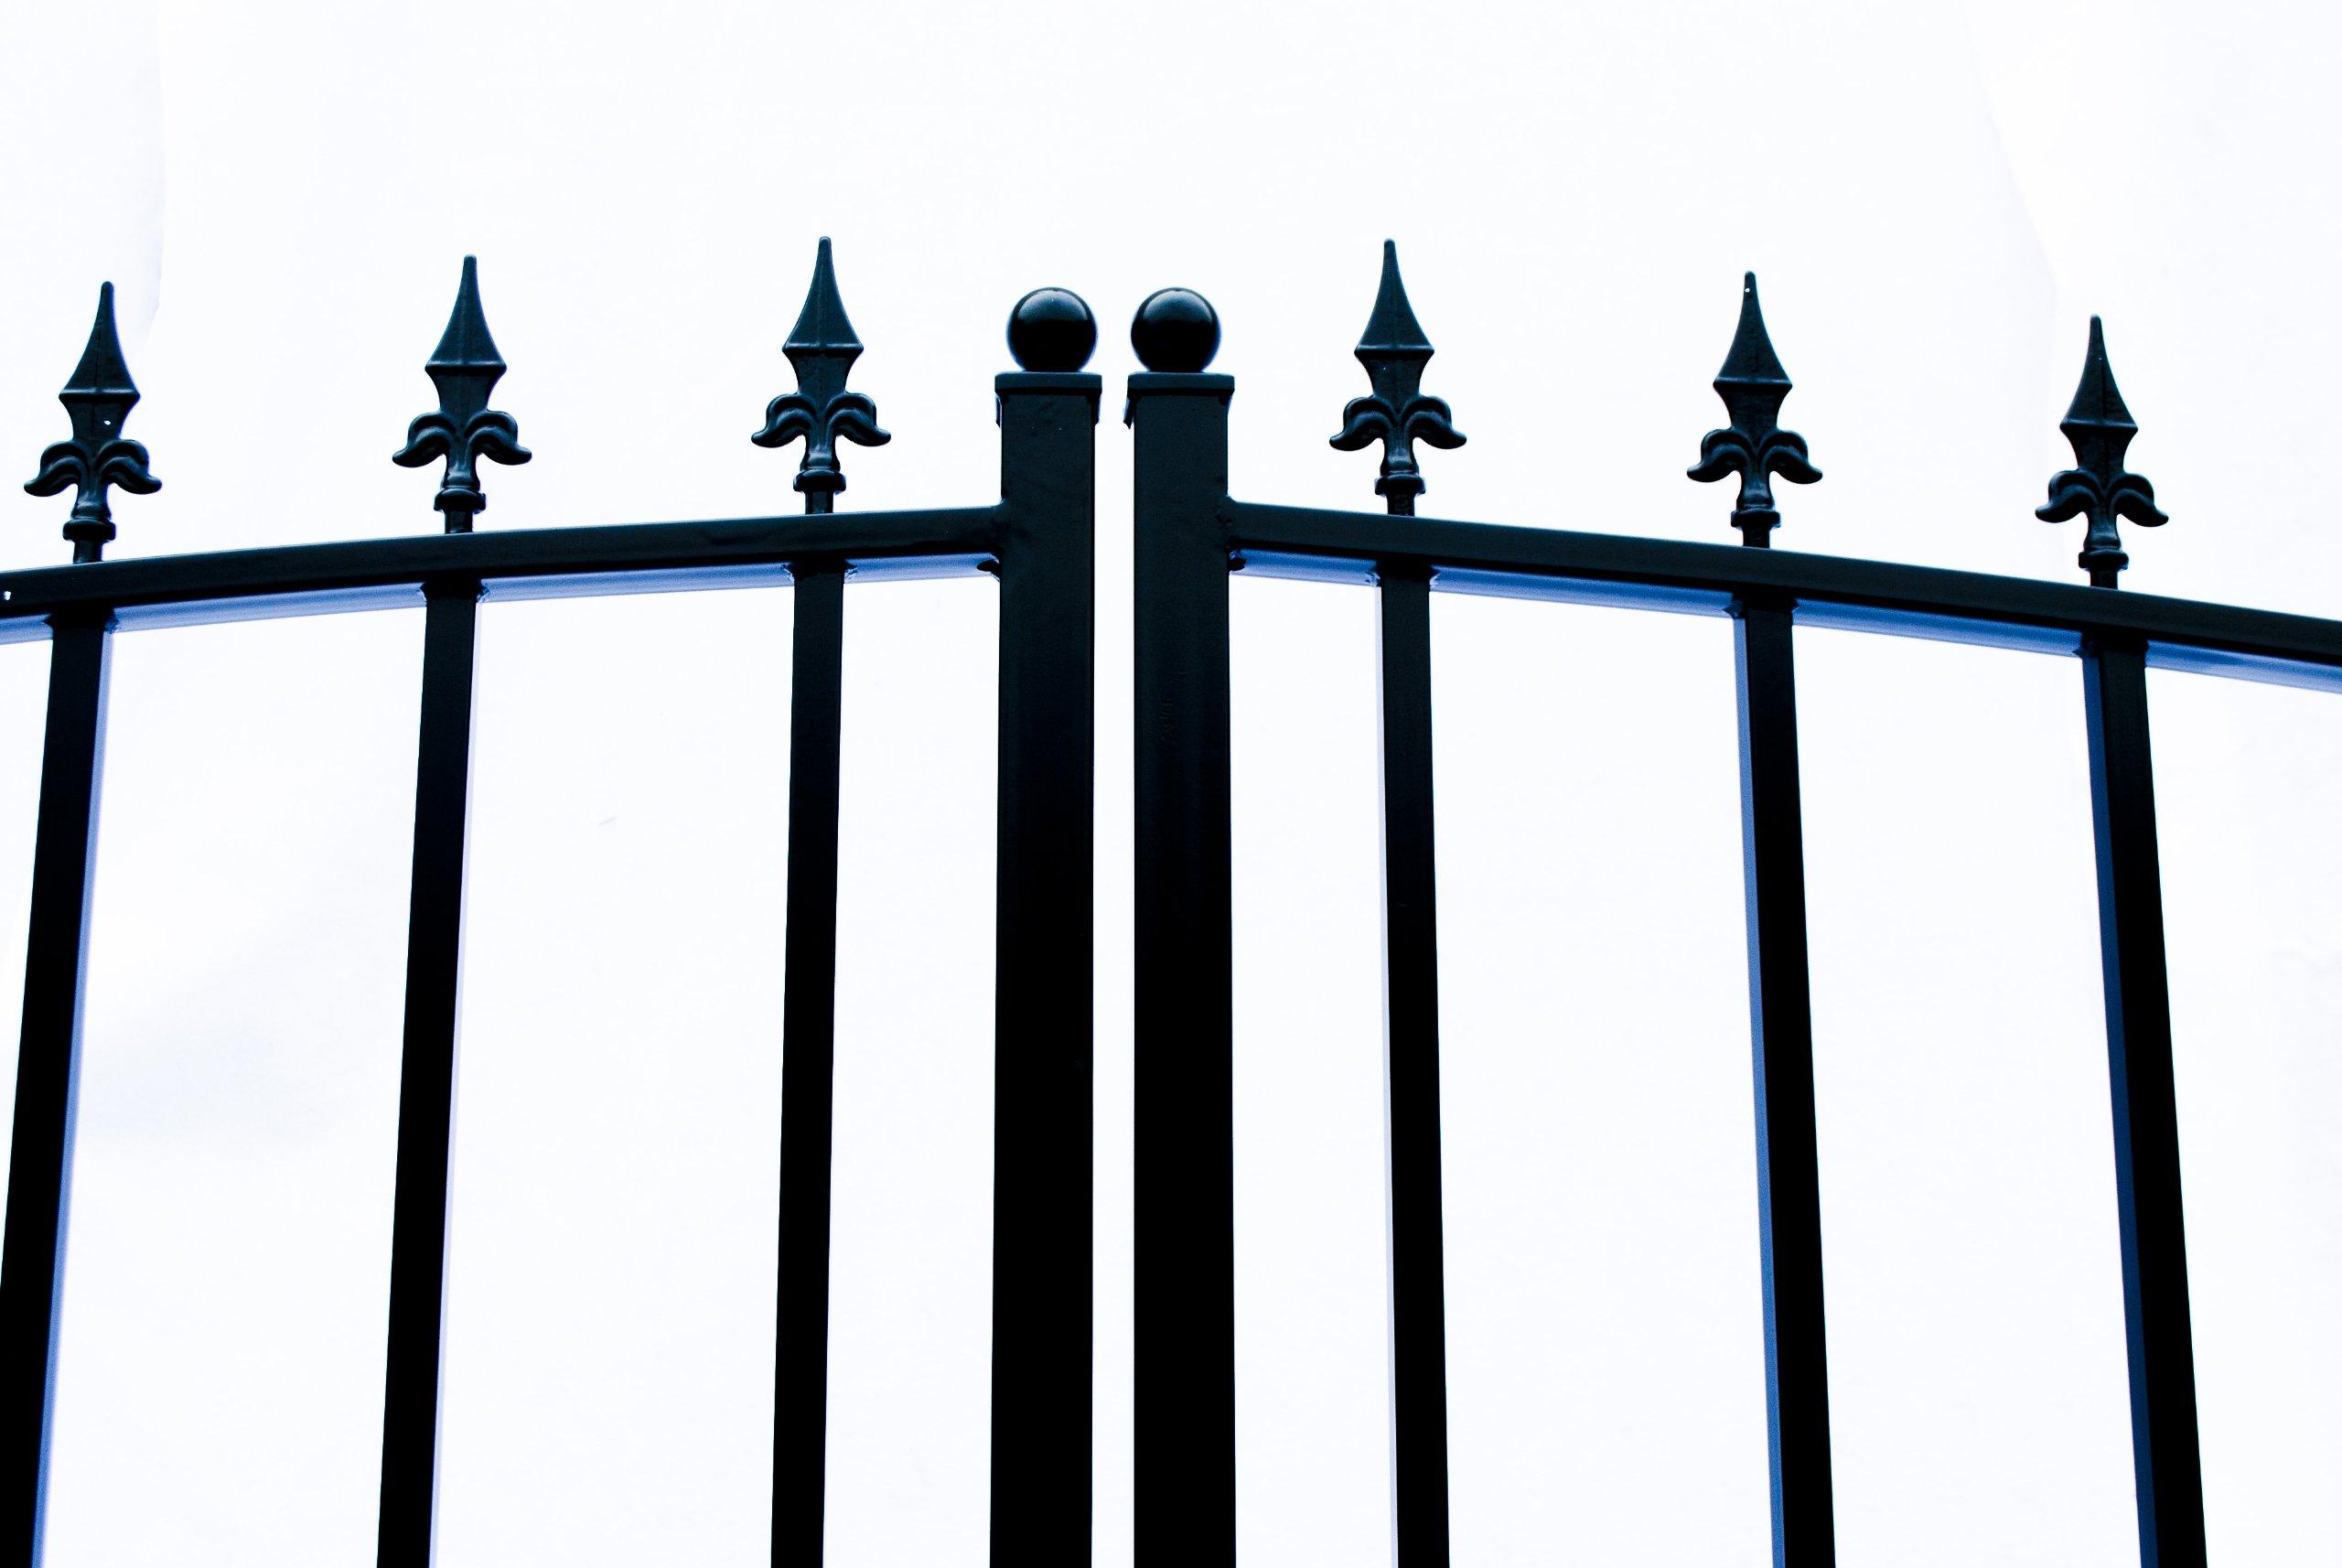 ALEKO Munich Style Iron Wrought Gate 16' Ornamental Dual Swing Driveway Gates 16'